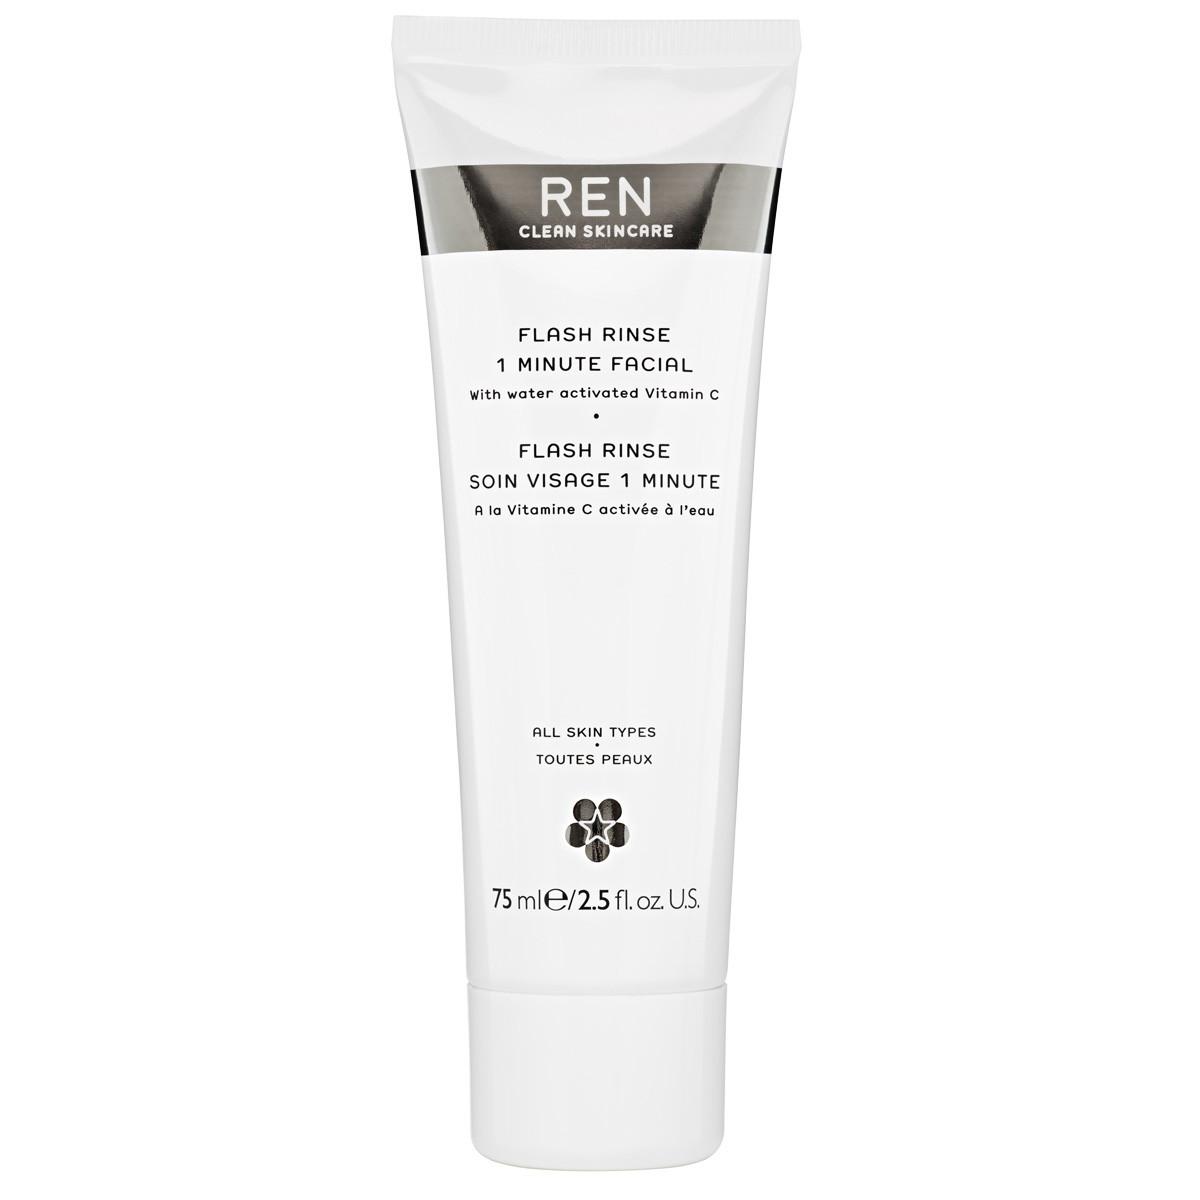 ren-clean-skincare-flash-rinse-one-minute-facial-gesichtspflege-mit-vitamin-c